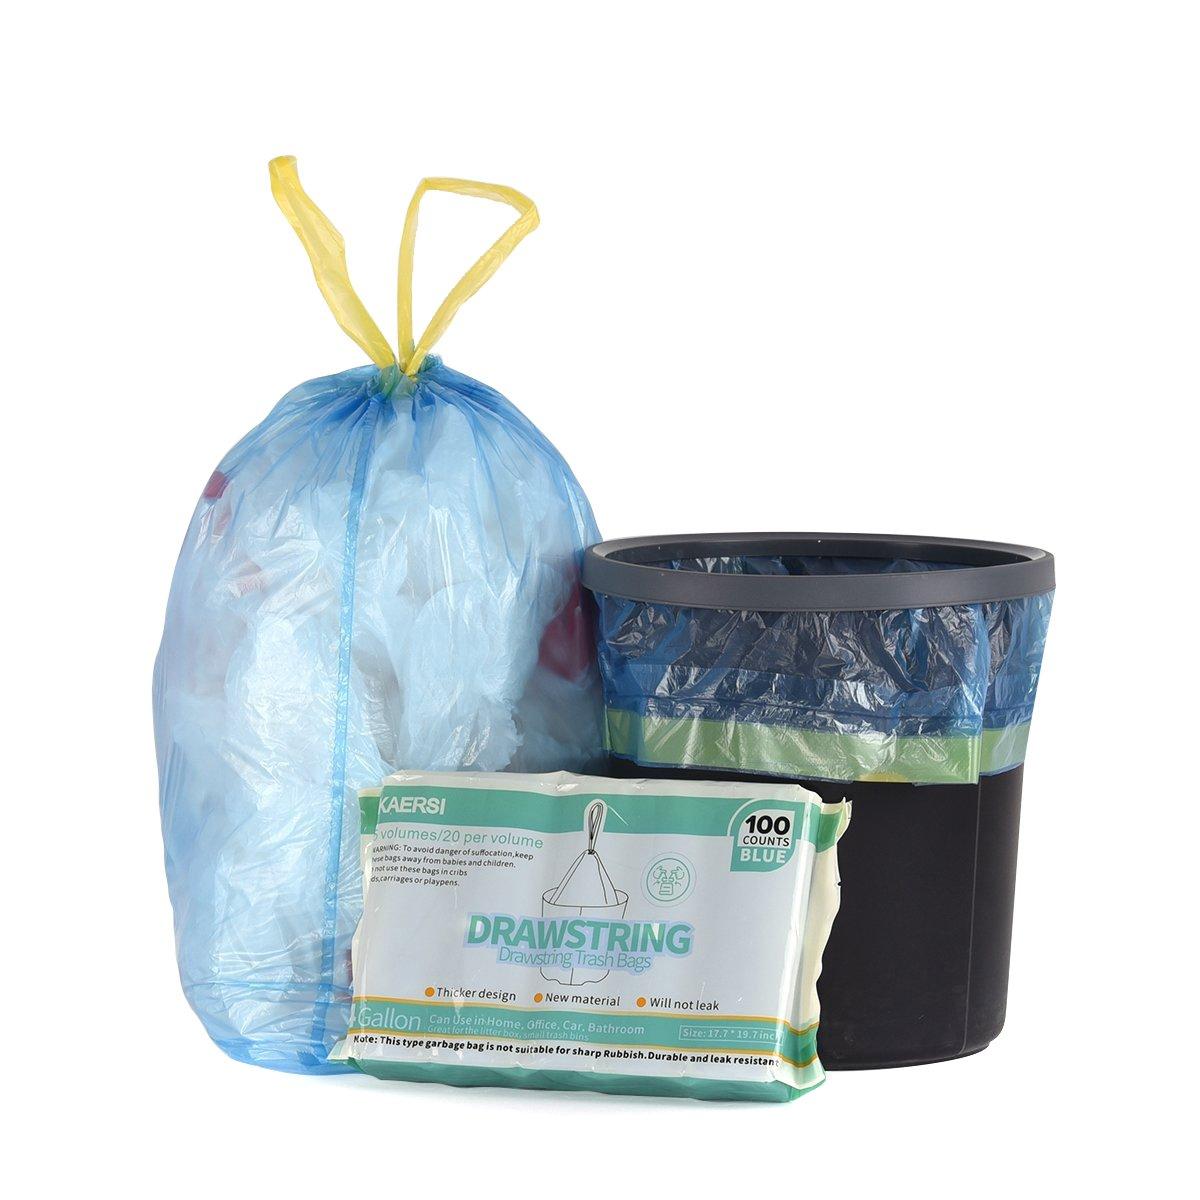 Amazon.com: KAERSI Small Drawstring Trash Bags for Bathroom, Kitchen ...